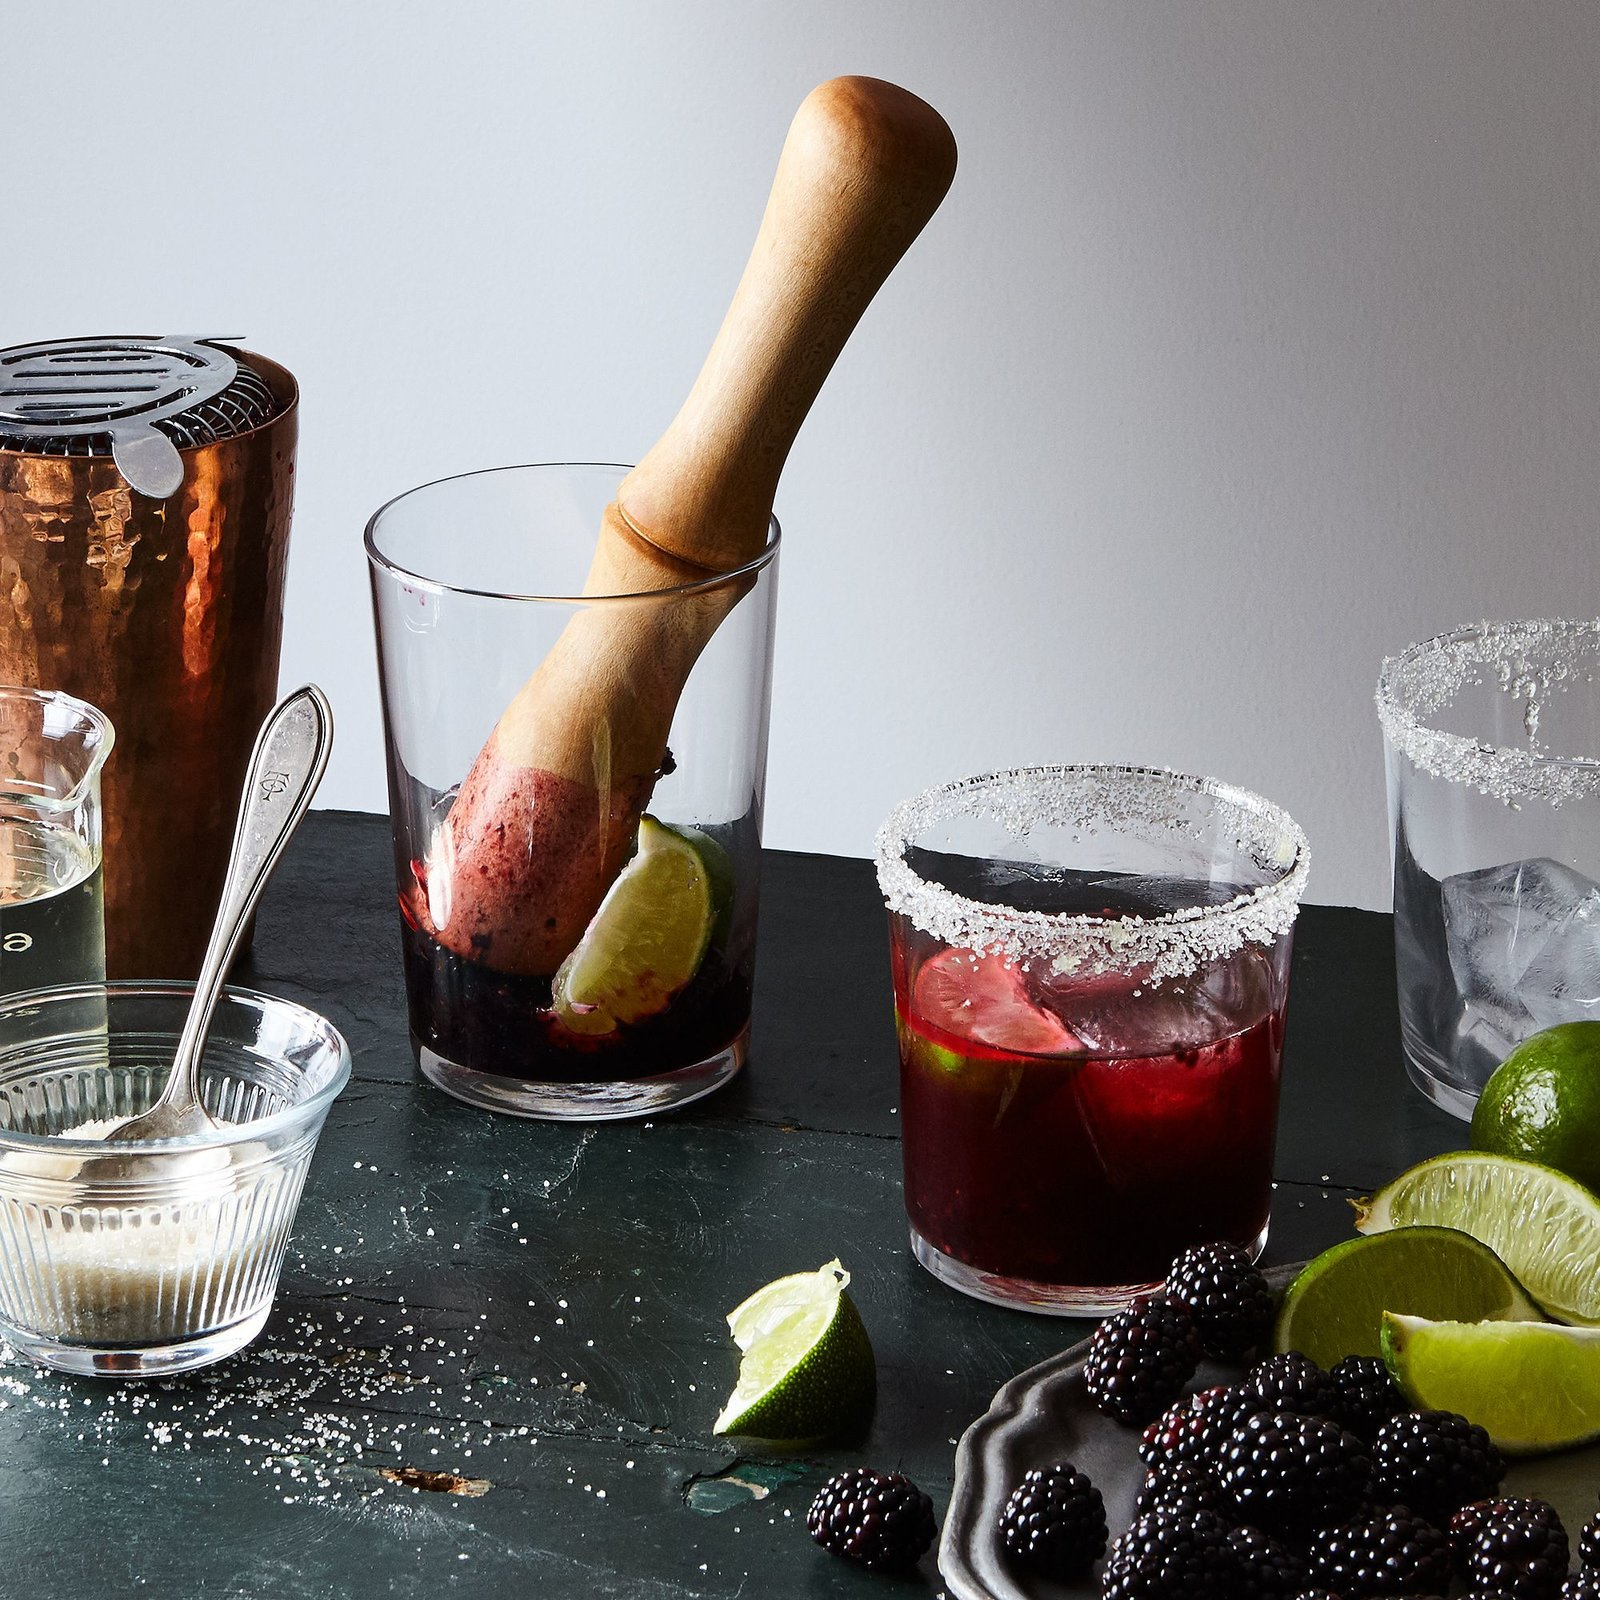 Blanc Creatives Lathe-Turned Wood Cocktail Muddler